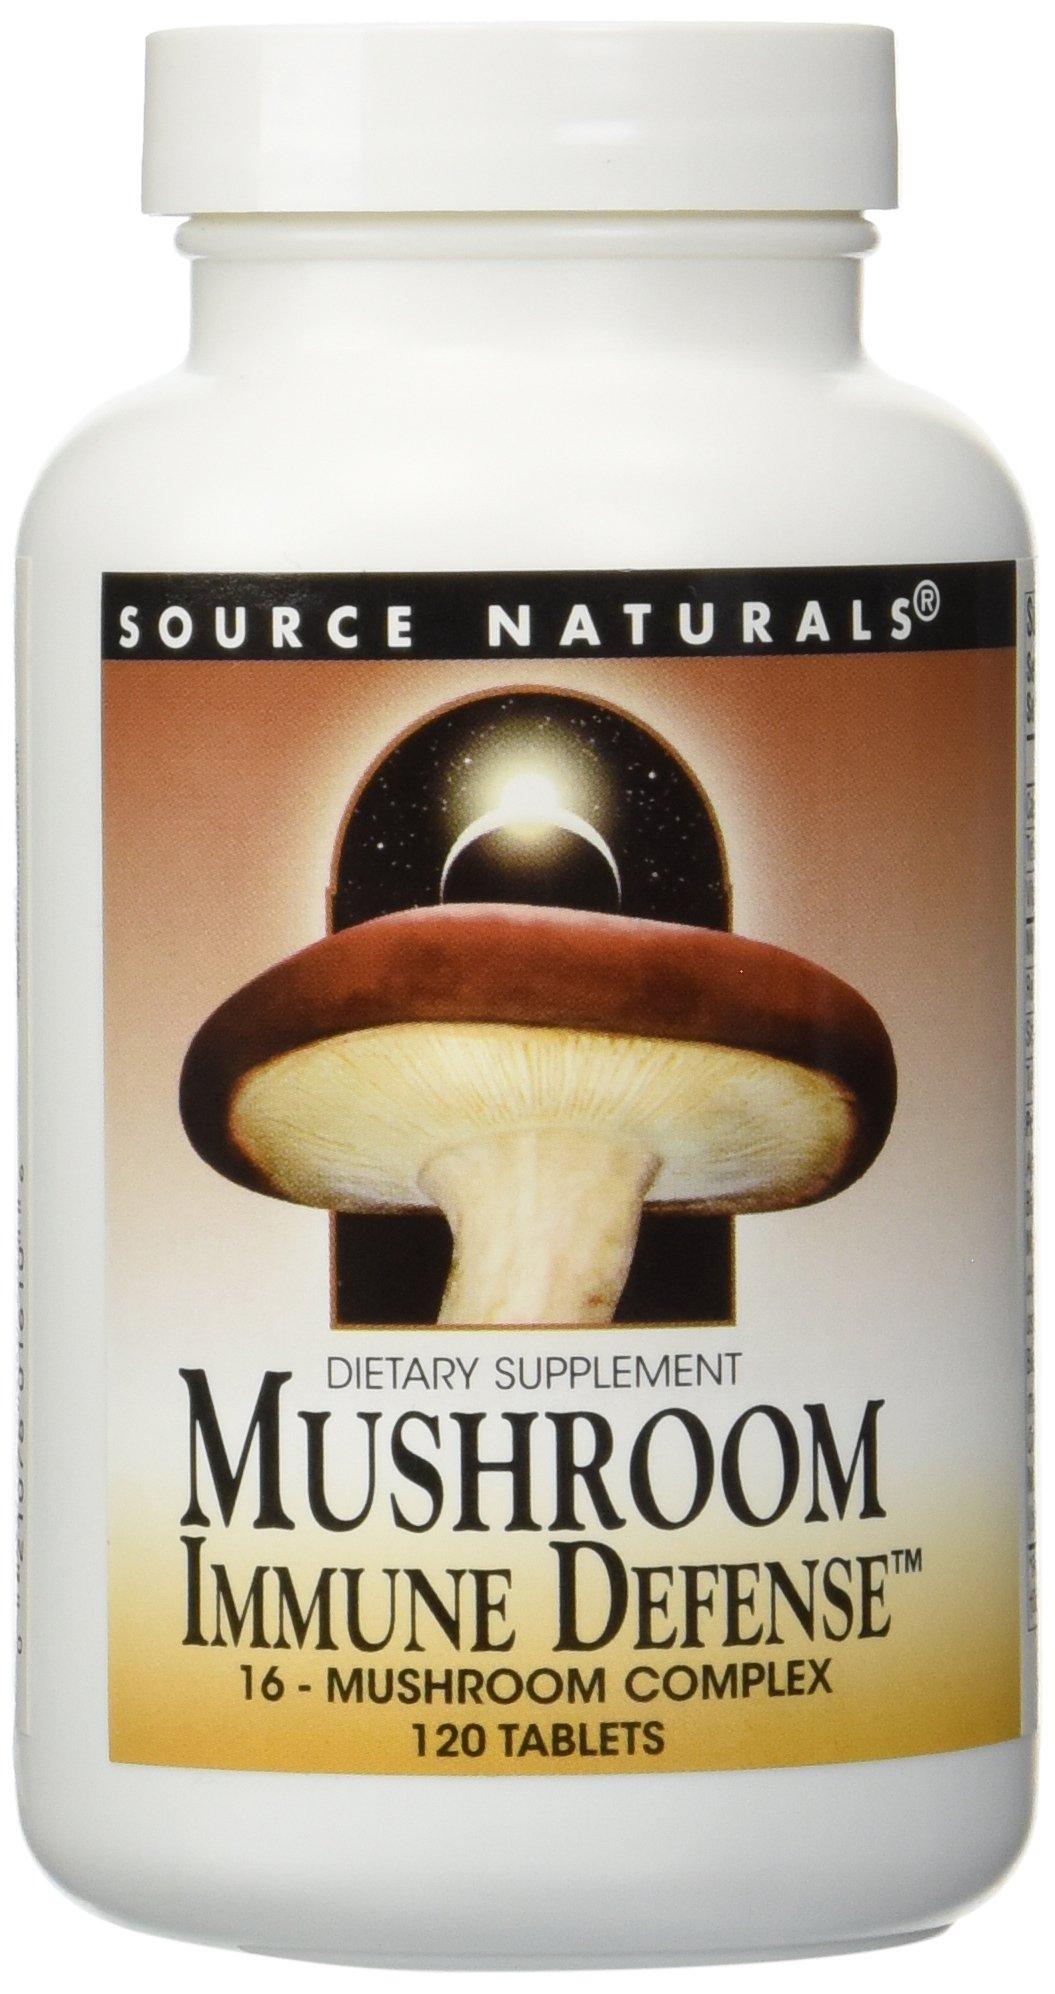 Source Naturals - Mushroom Immune Defense, 120 tablets